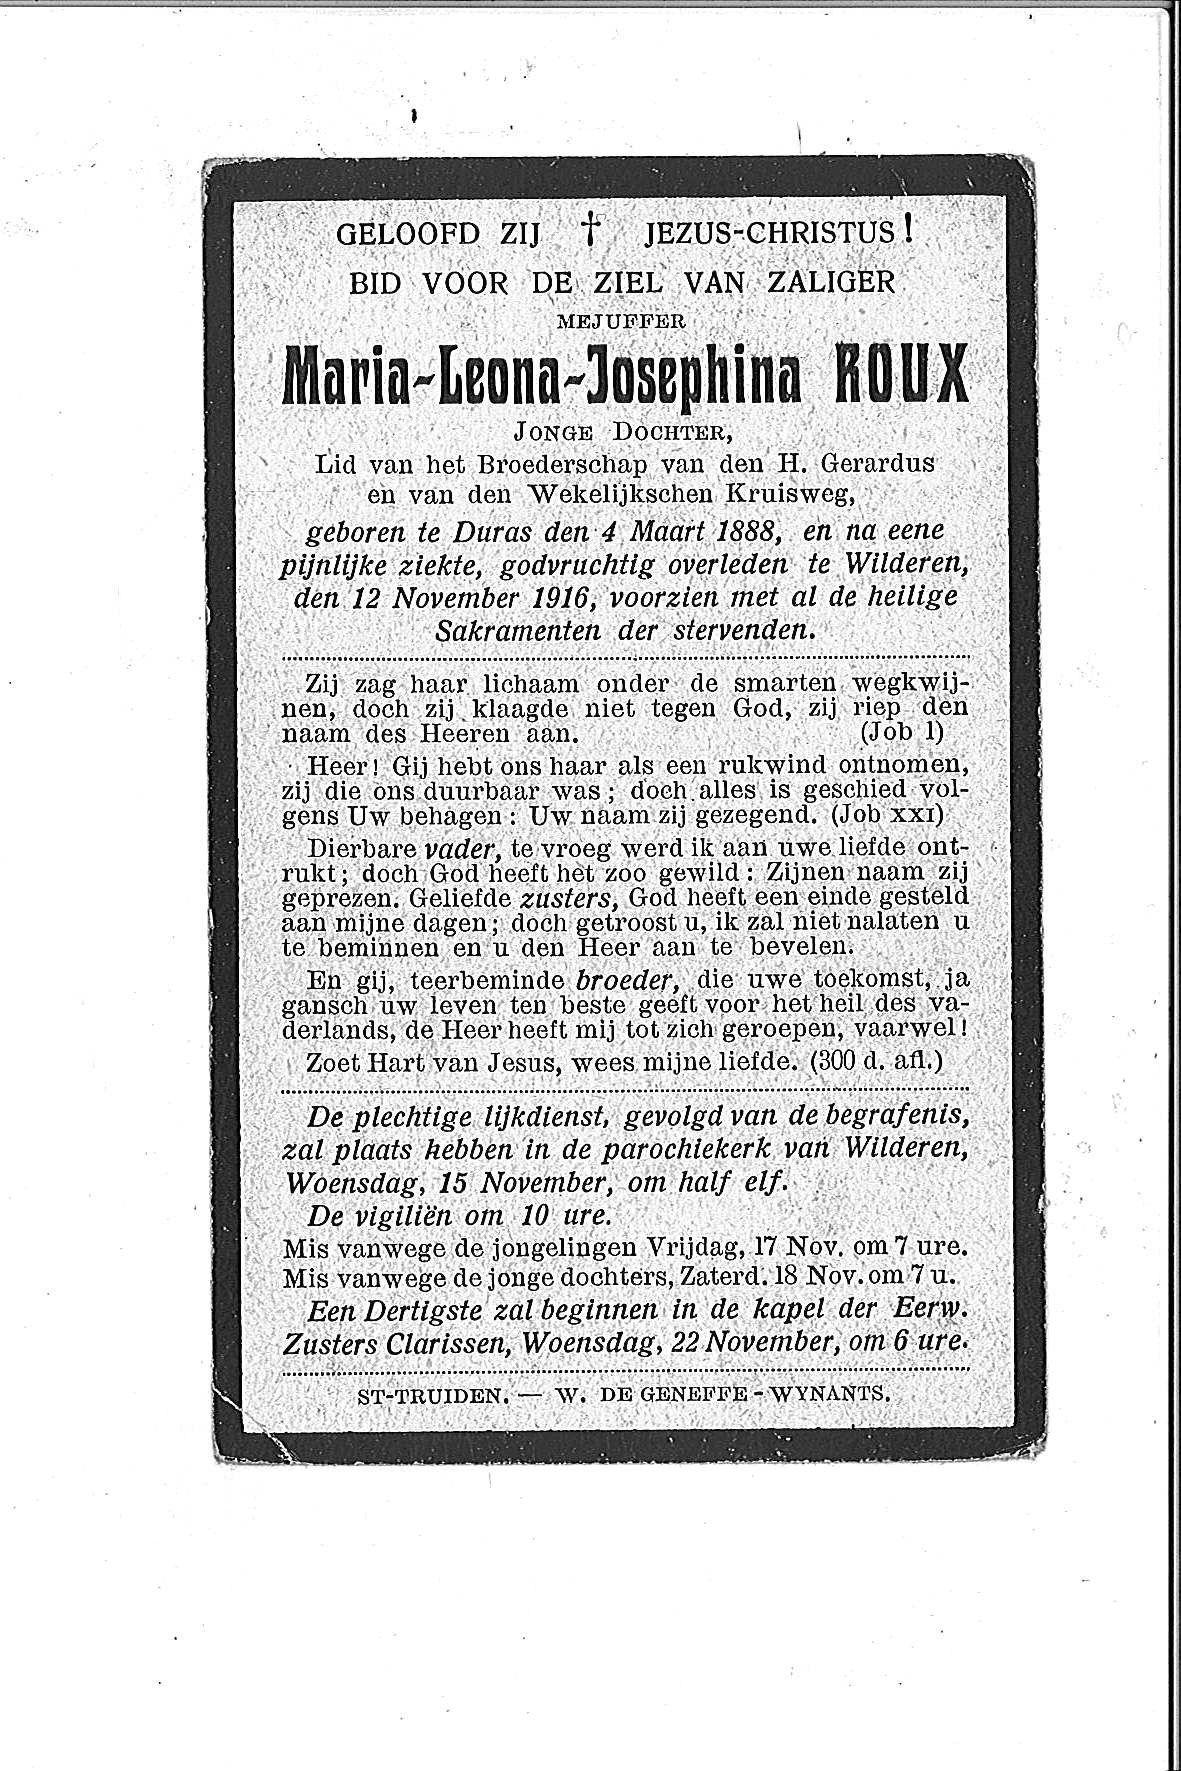 Maria-Leona-Josephina(1916)20150106152215_00063.jpg